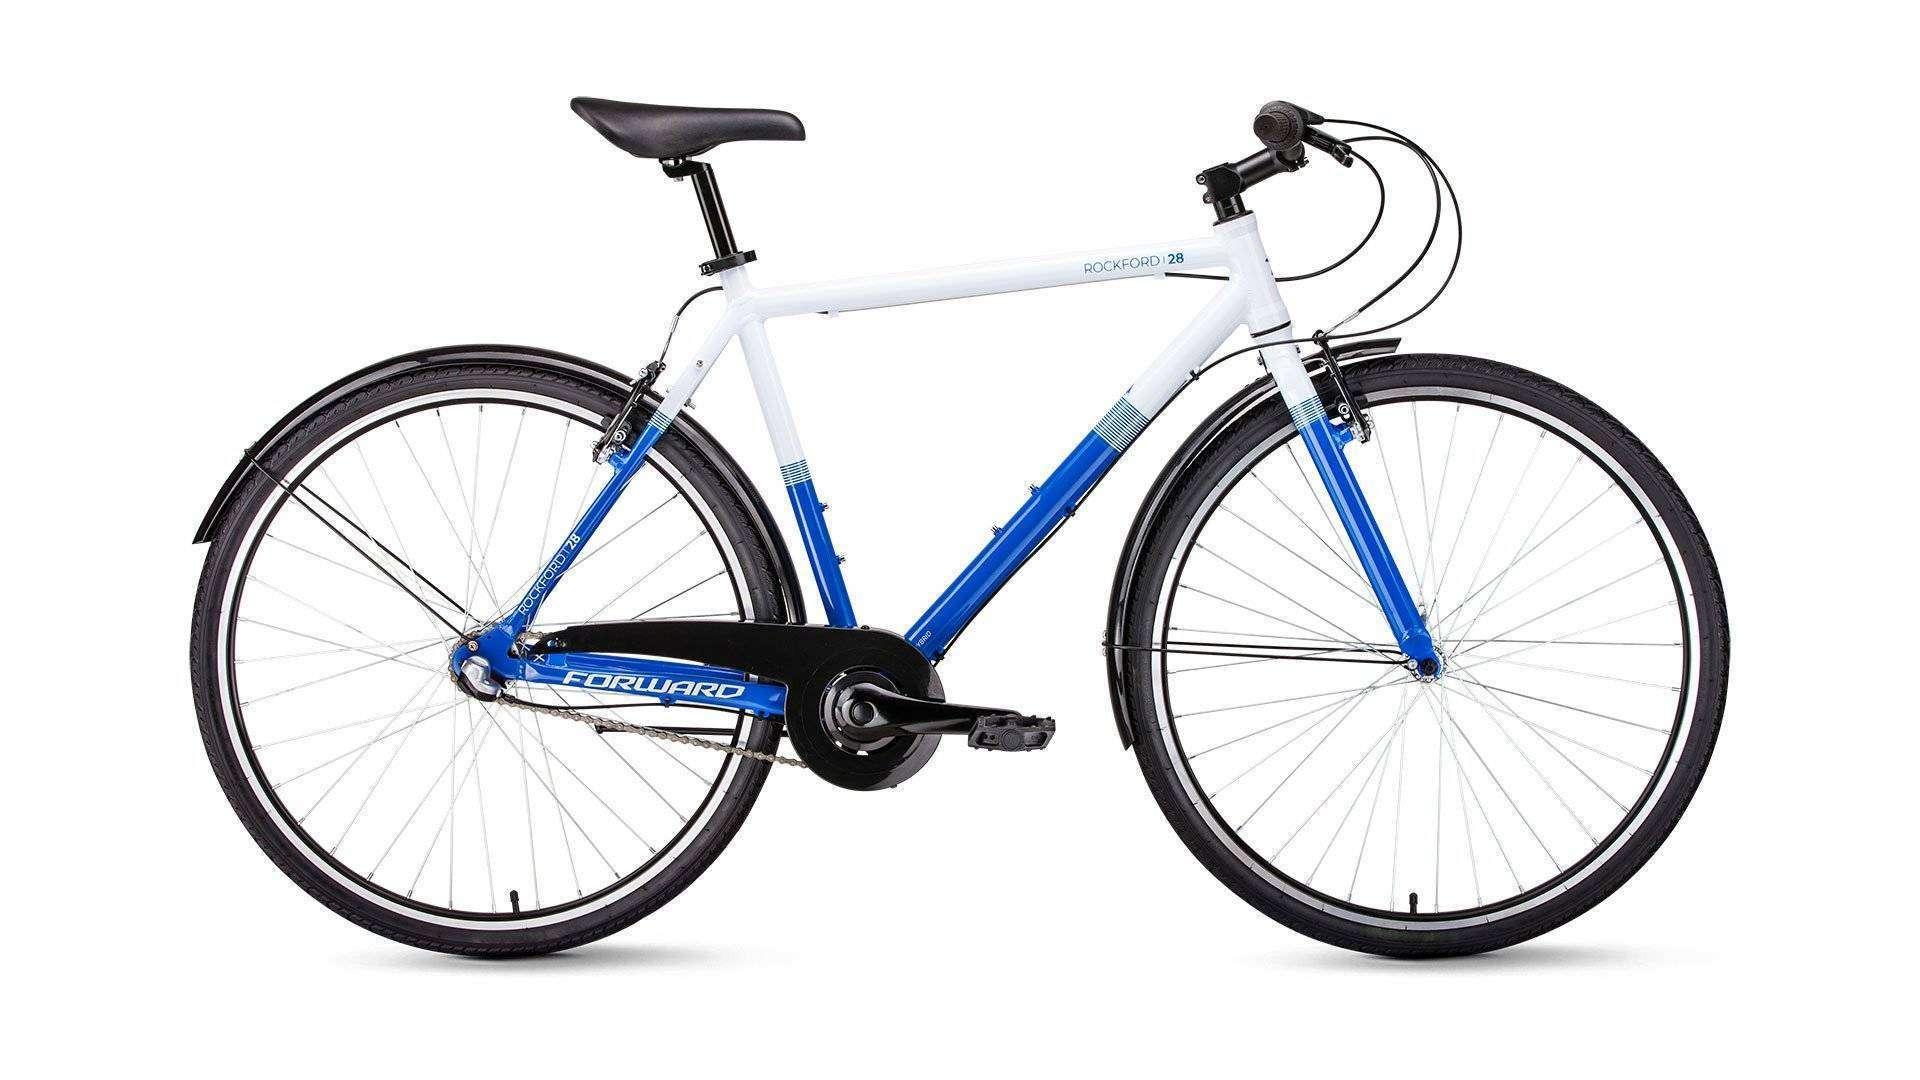 Велосипед FORWARD ROCKFORD 28 2018-2019 41543